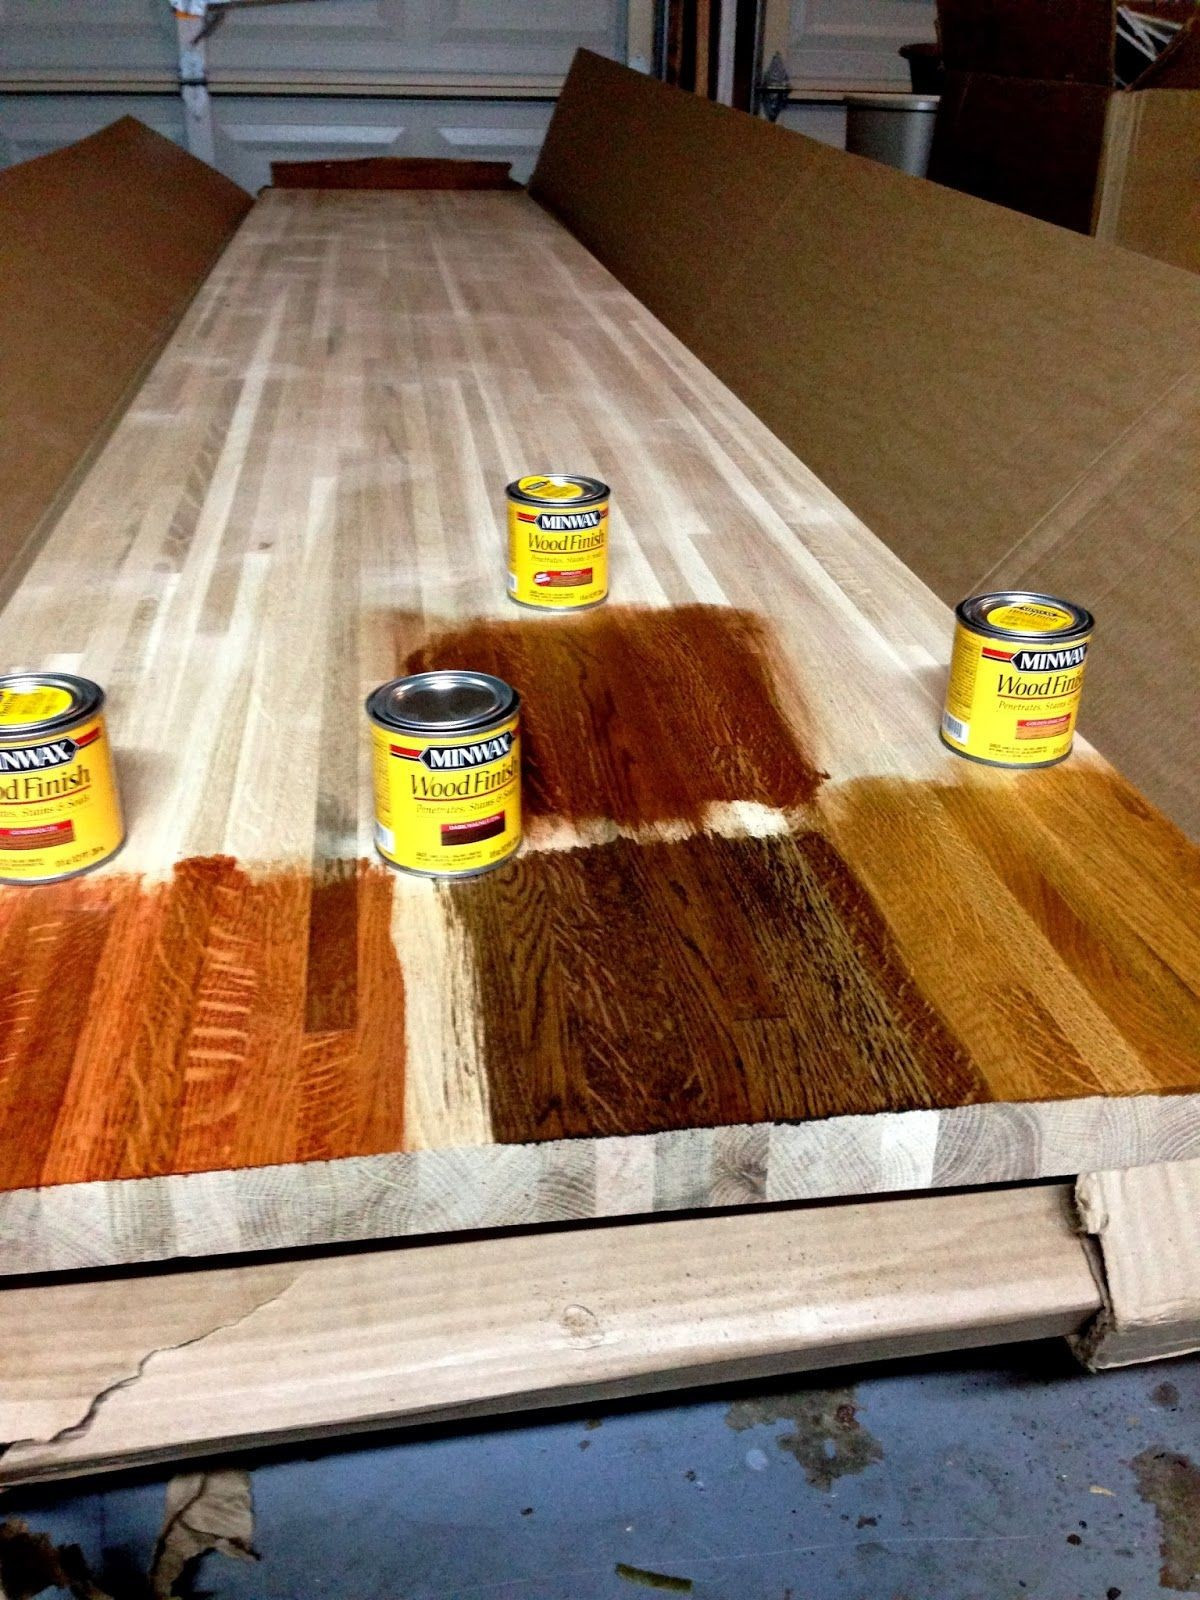 A Hardwood Floor Specialist Denver Of 20 Unique Hardwood Flooring Table top Flooring Ideas In Hardwood Flooring Table top Fresh Finishing A Kitchen Table top Best Best Finish for Wood Kitchen